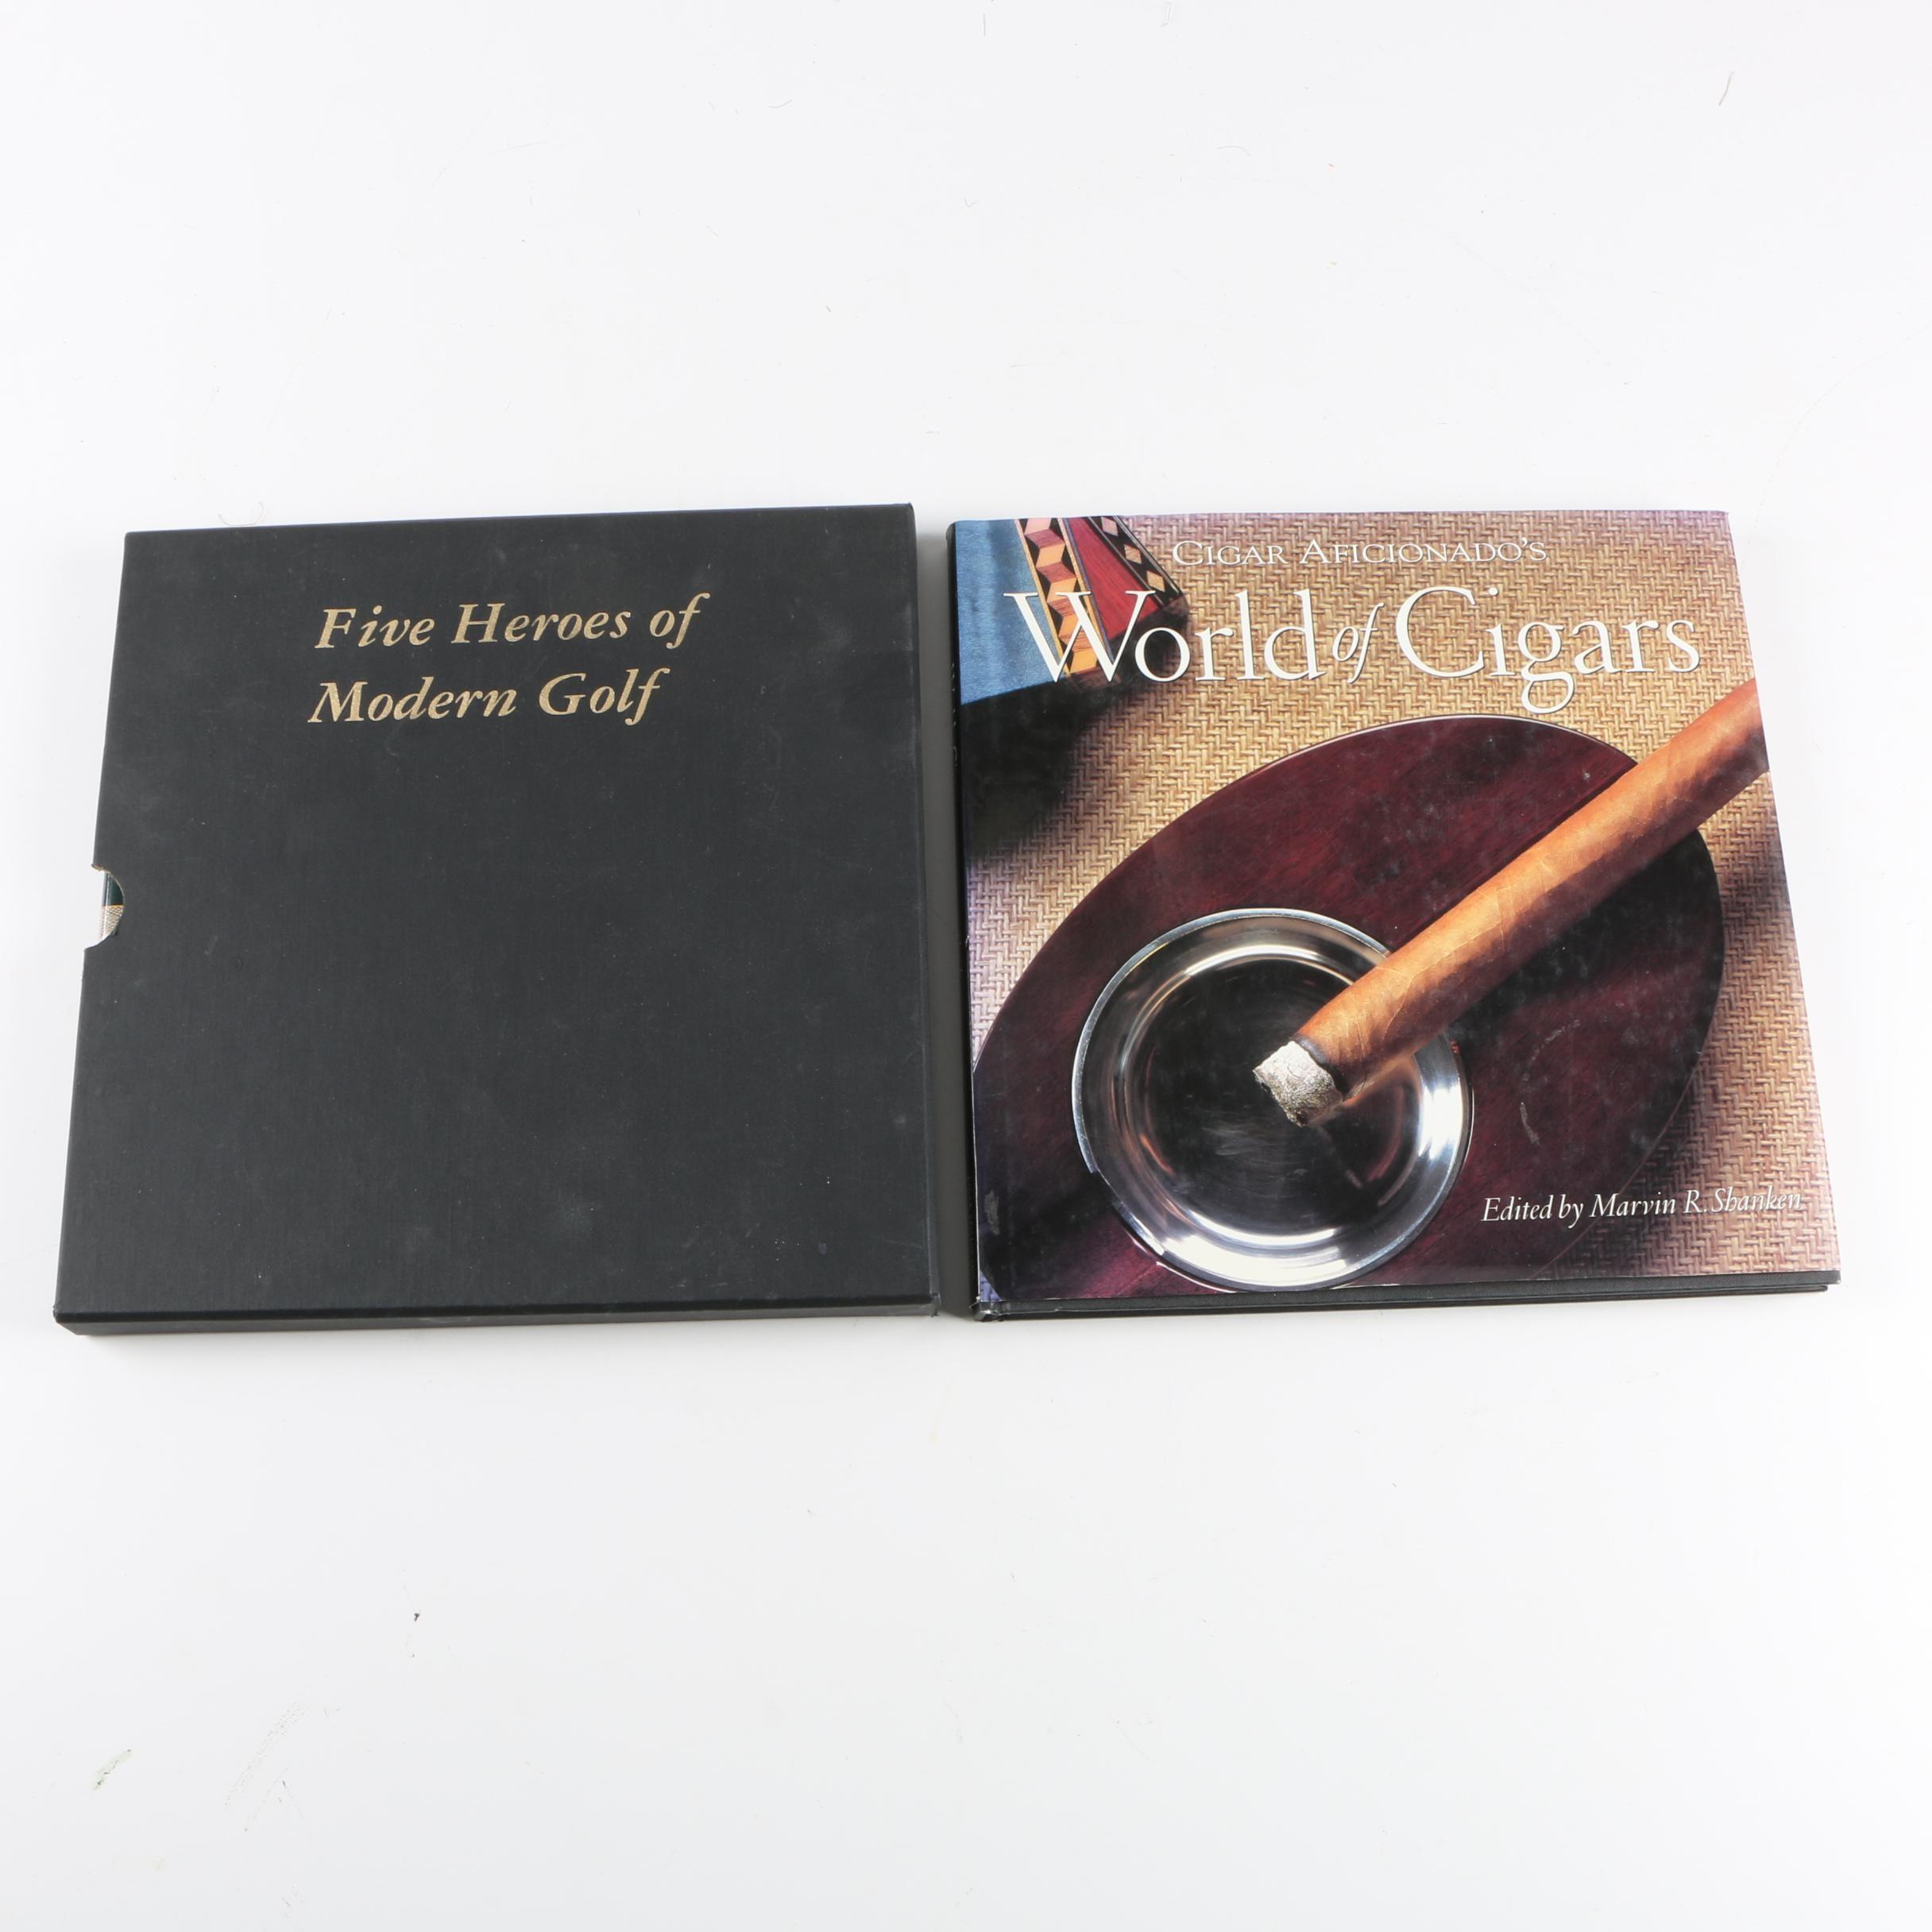 """Five Heroes of Modern Golf"" and ""Cigar Aficionado's World of Cigars"""